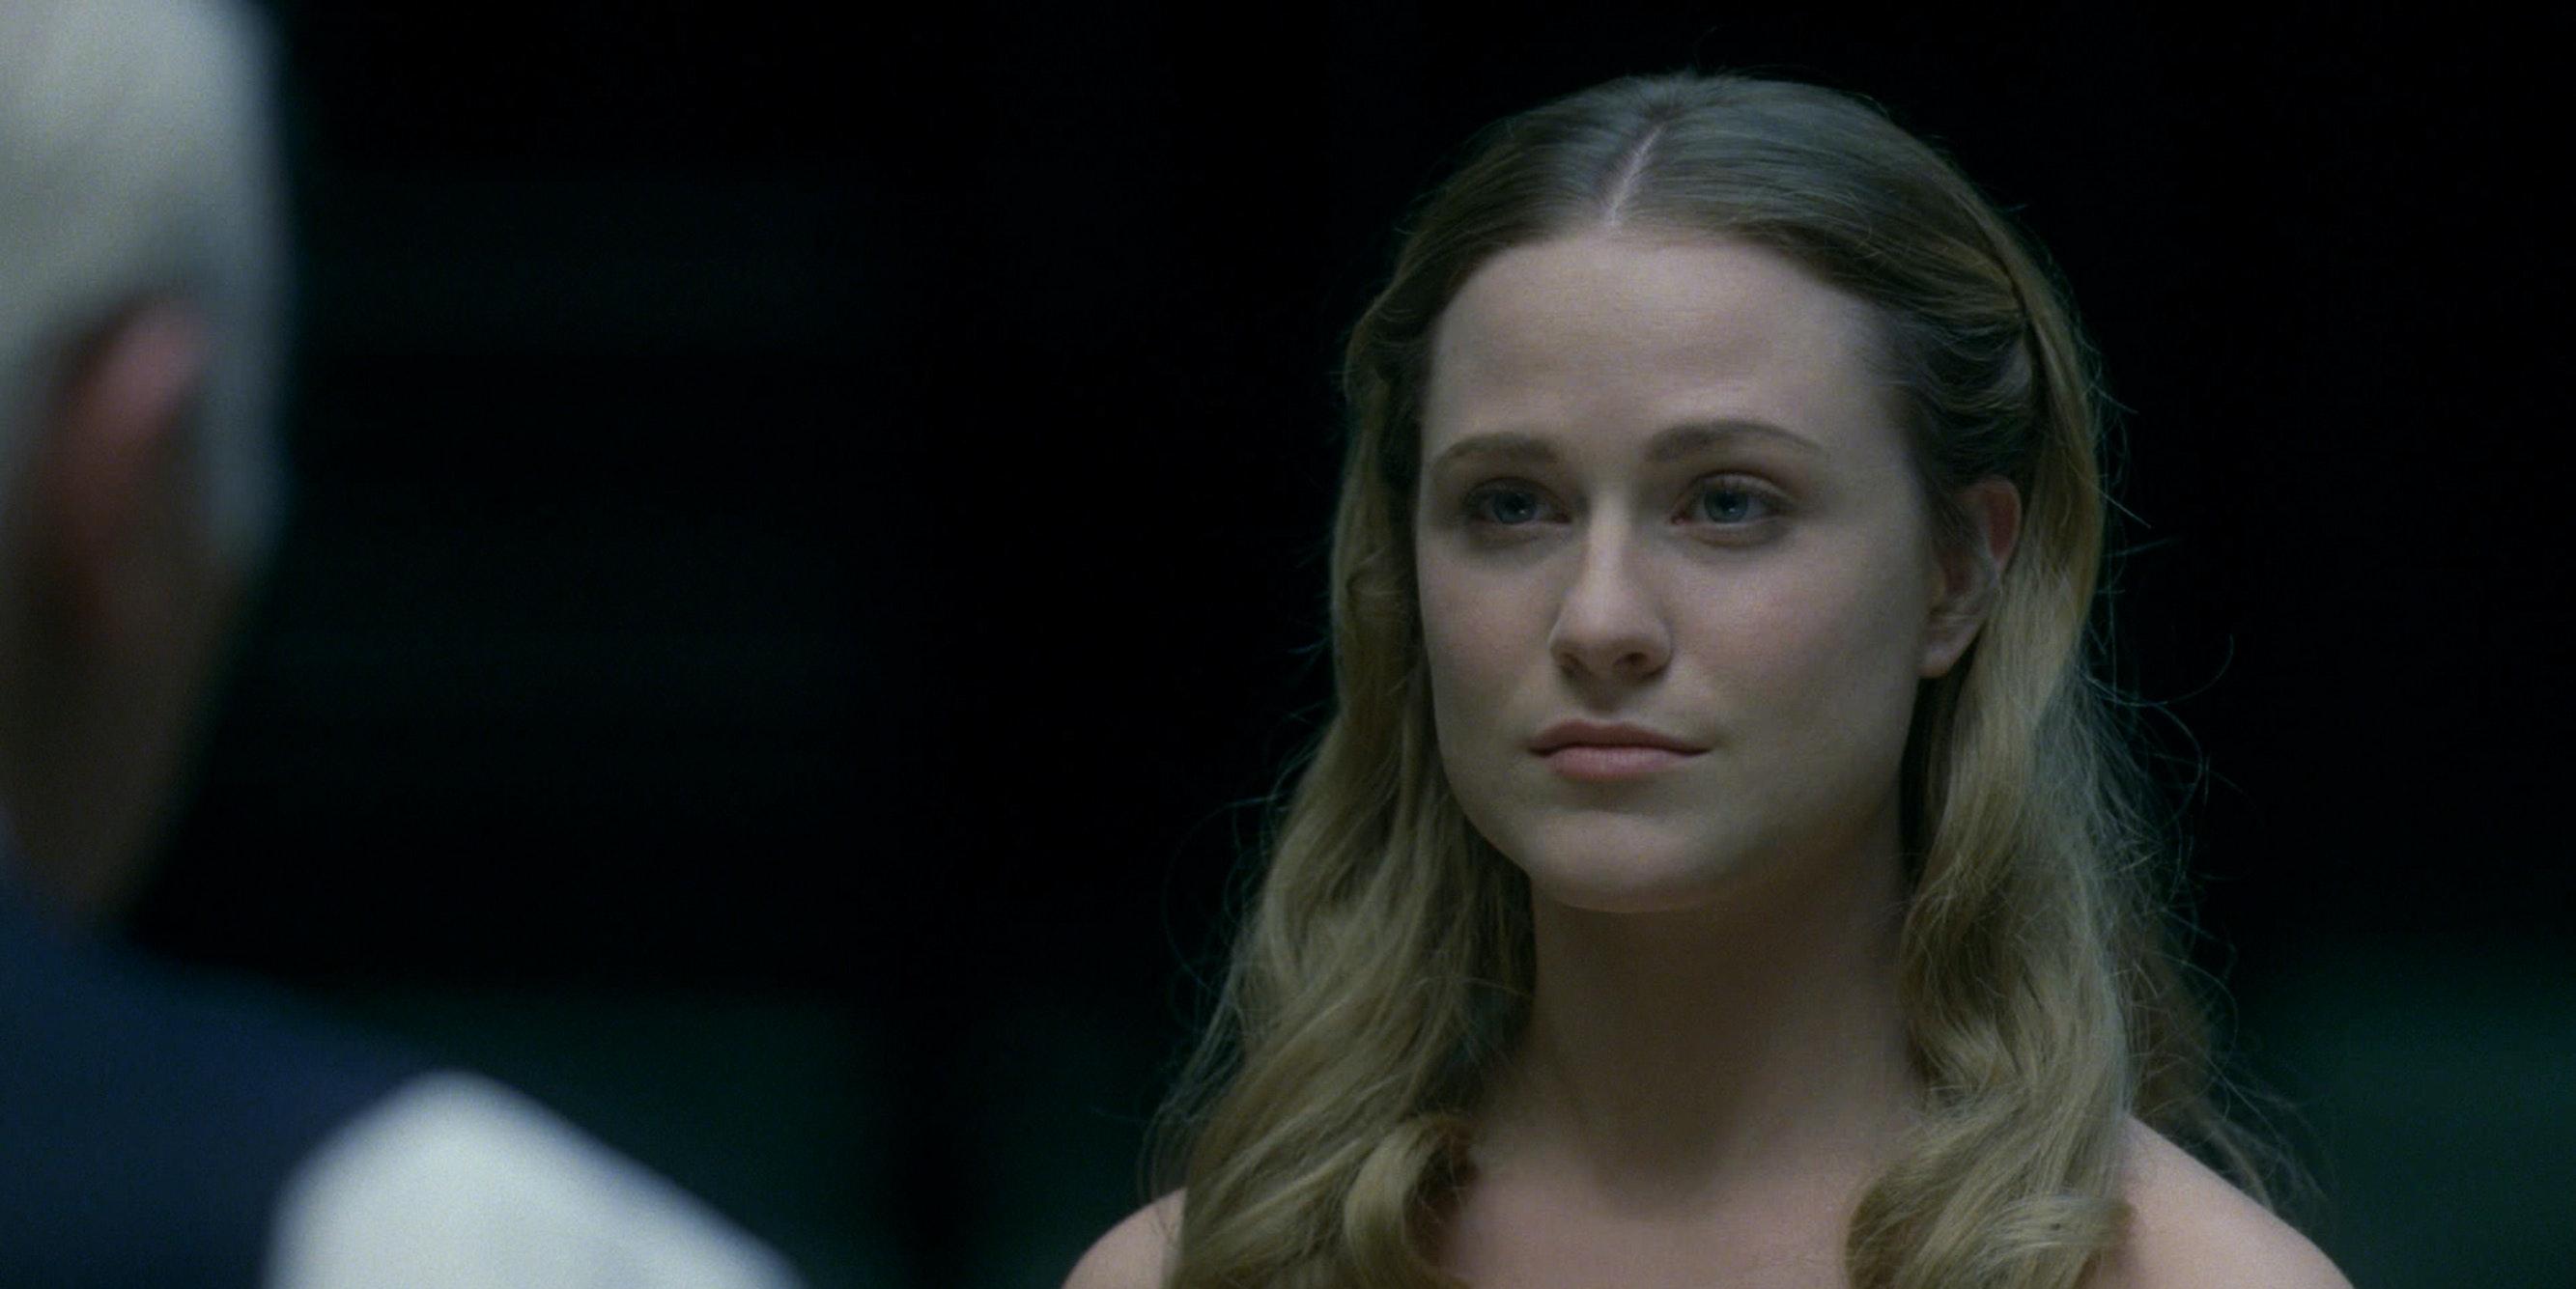 Dolores on 'Westworld' is genderless